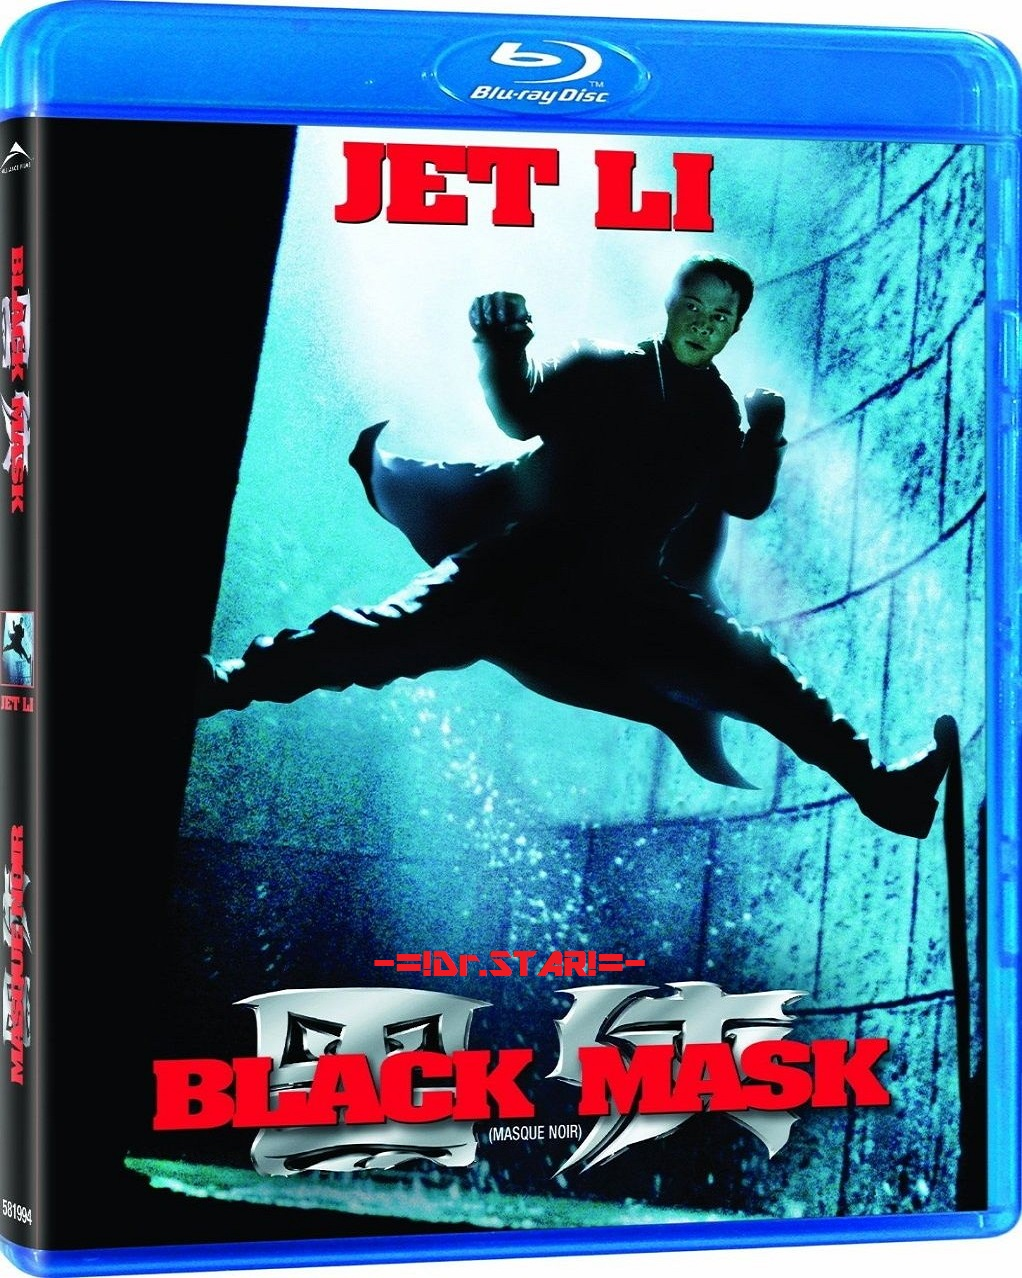 Black Mask 1996 720p 950MB BRRip Dual Audio